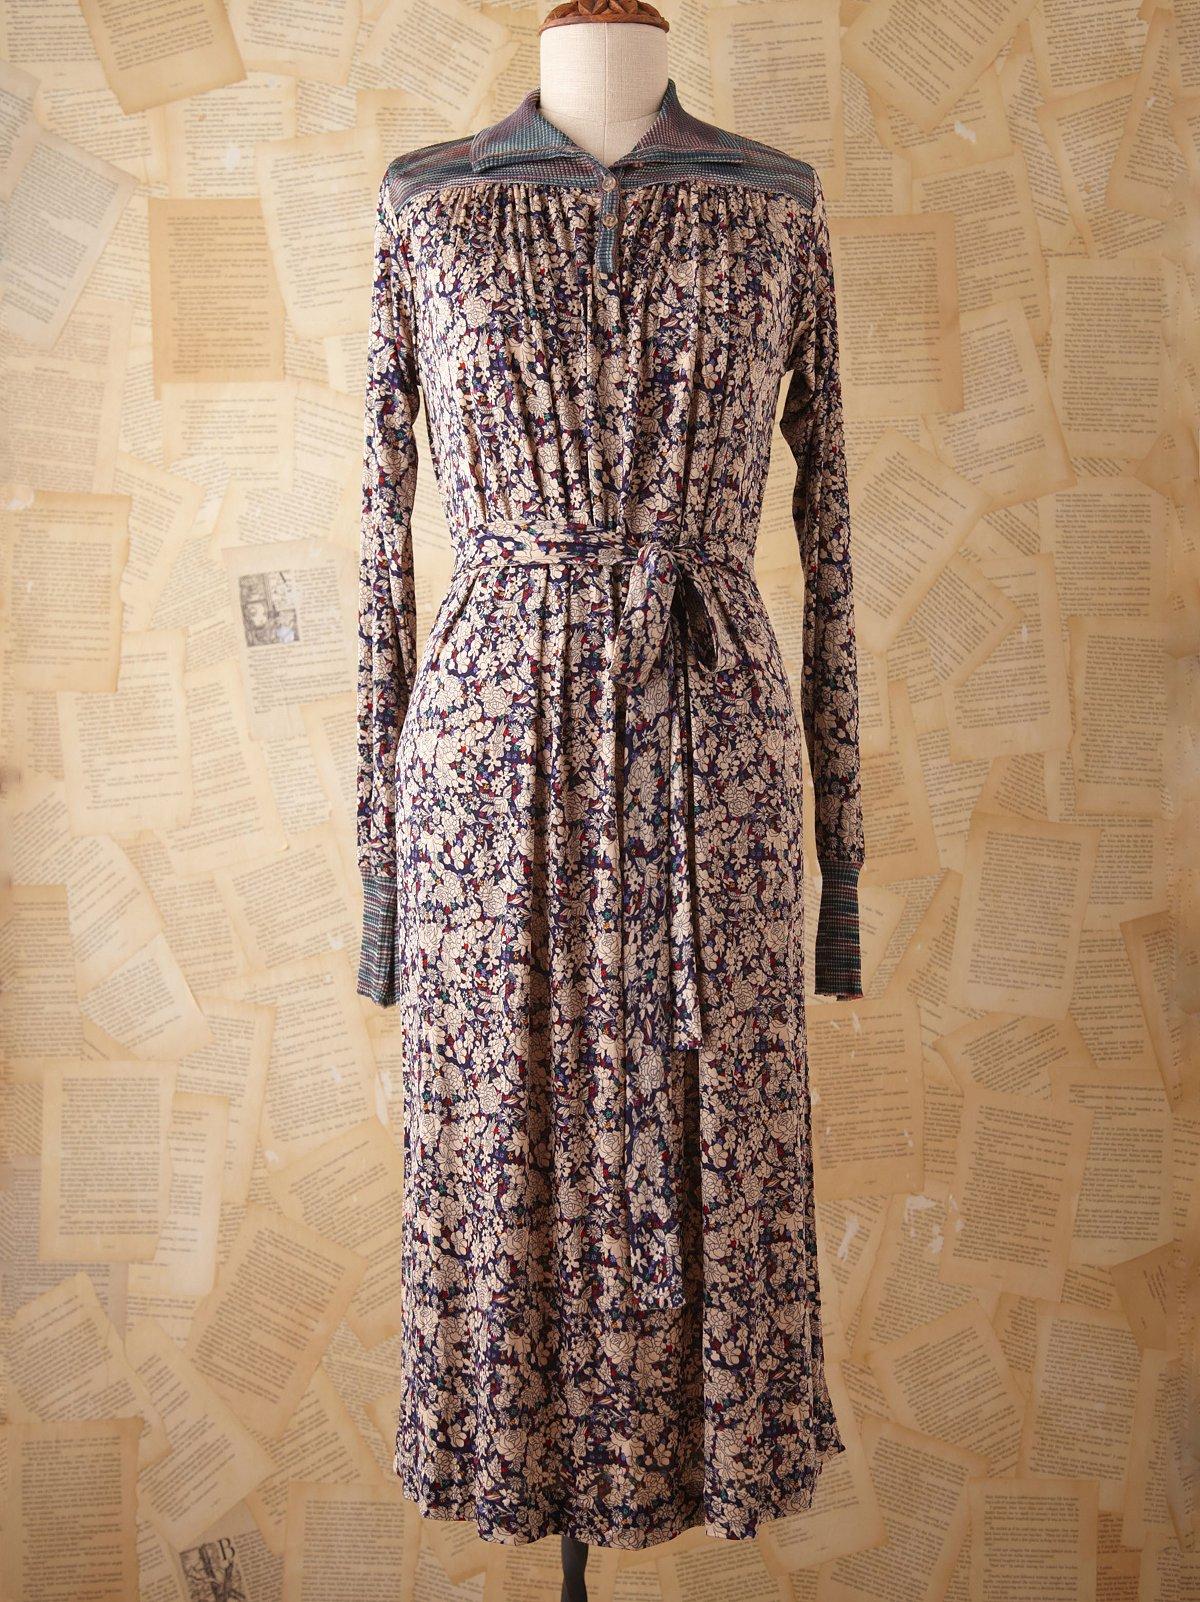 Vintage Missoni Floral Dress